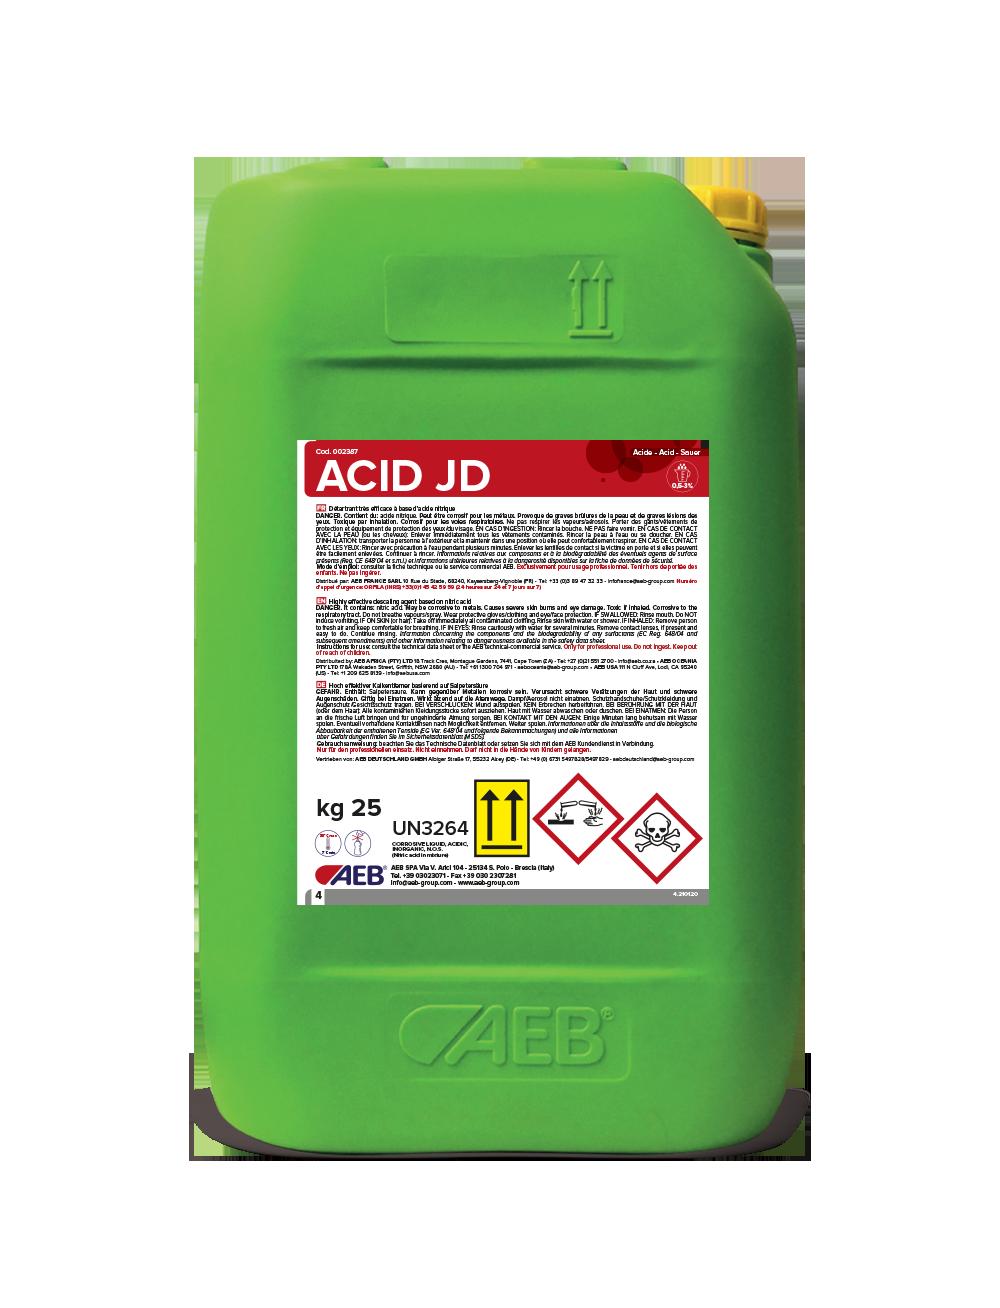 ACID JD